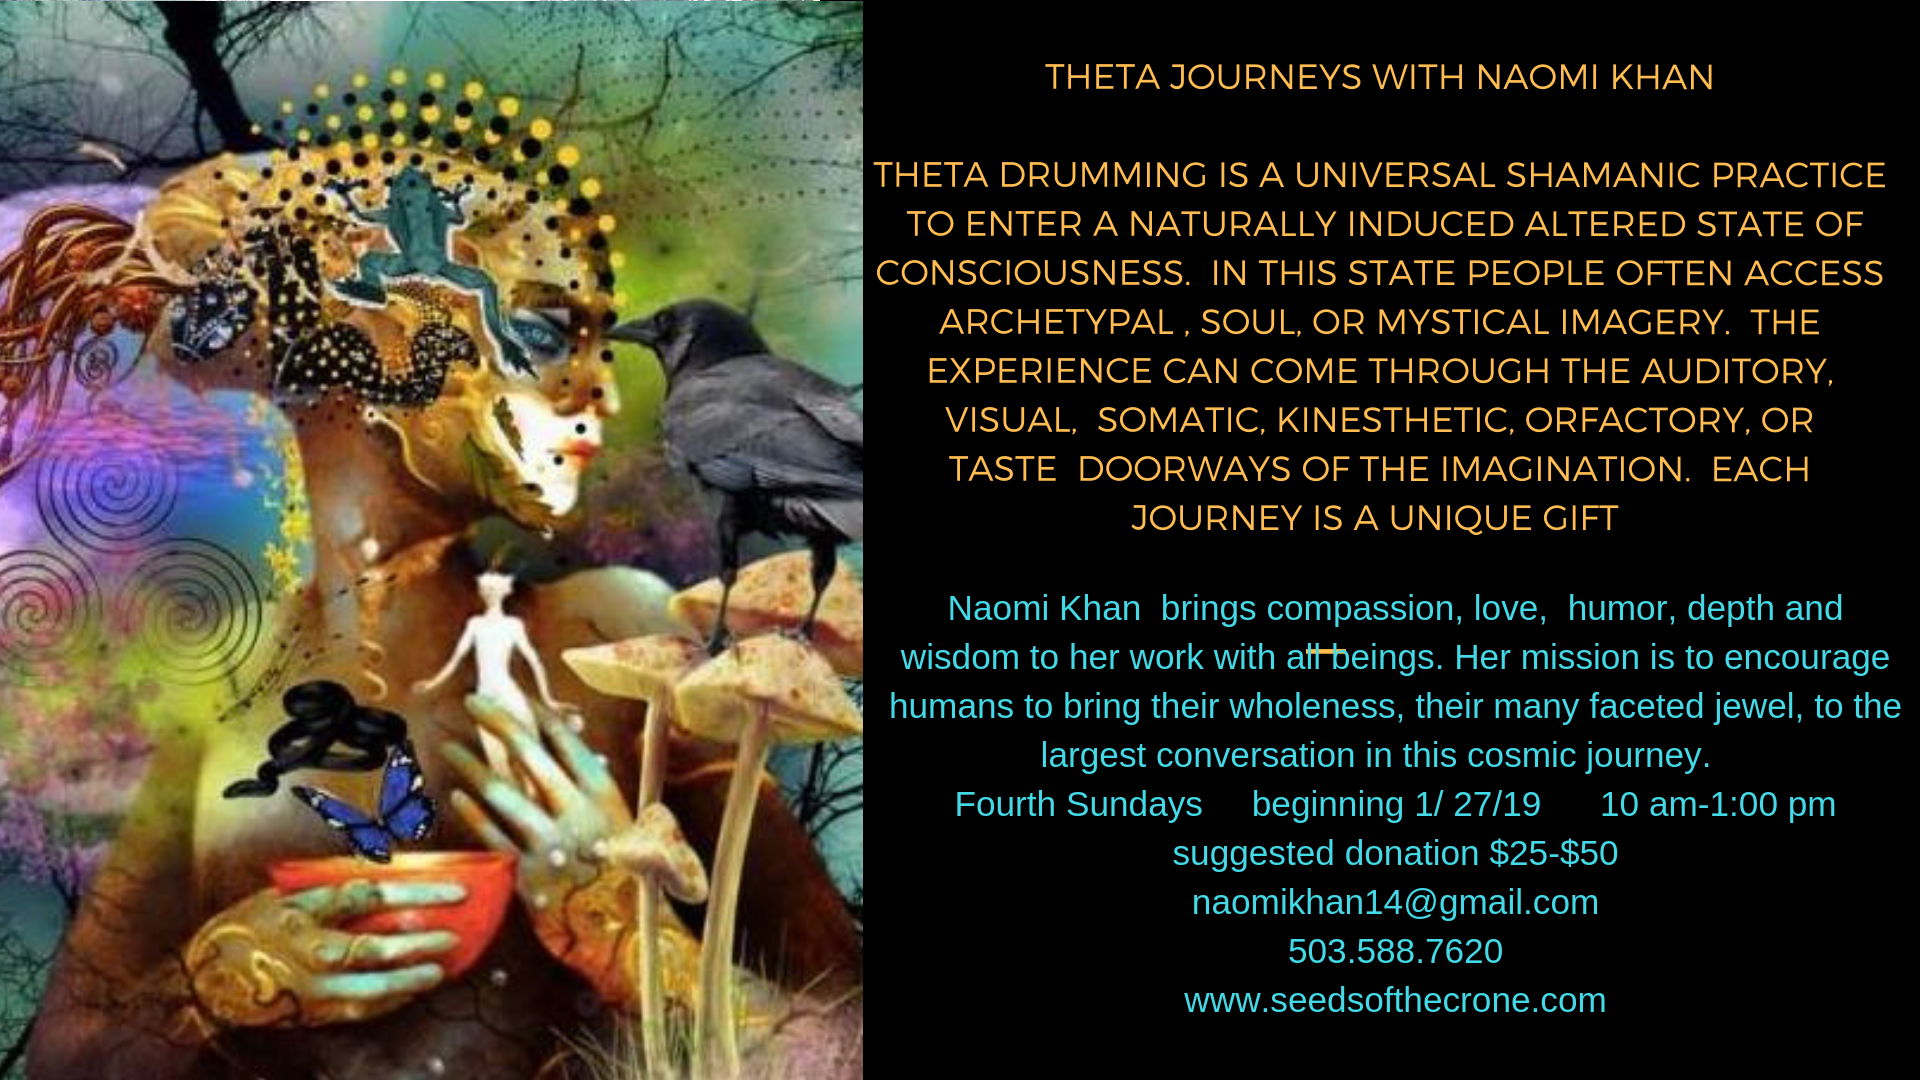 Theta Journeys-Naomi Khan  Fourth Sundays